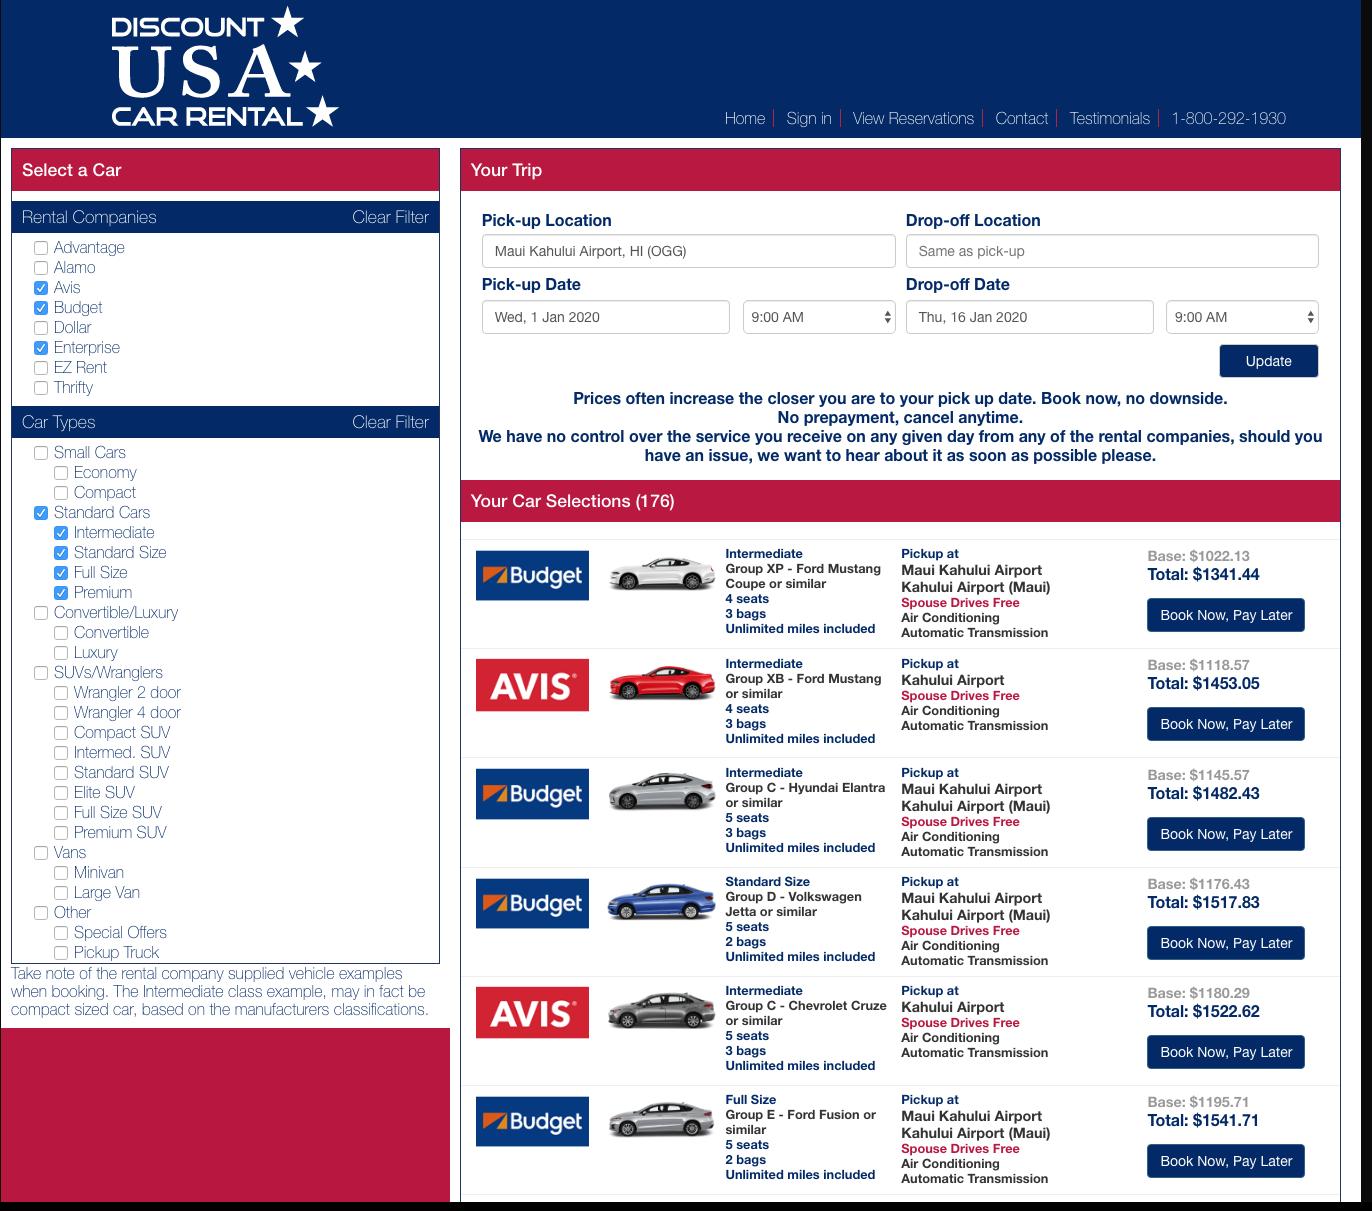 Car Rental Usa >> Discount Usa Car Rental Booking Engine And Website Clutch Co